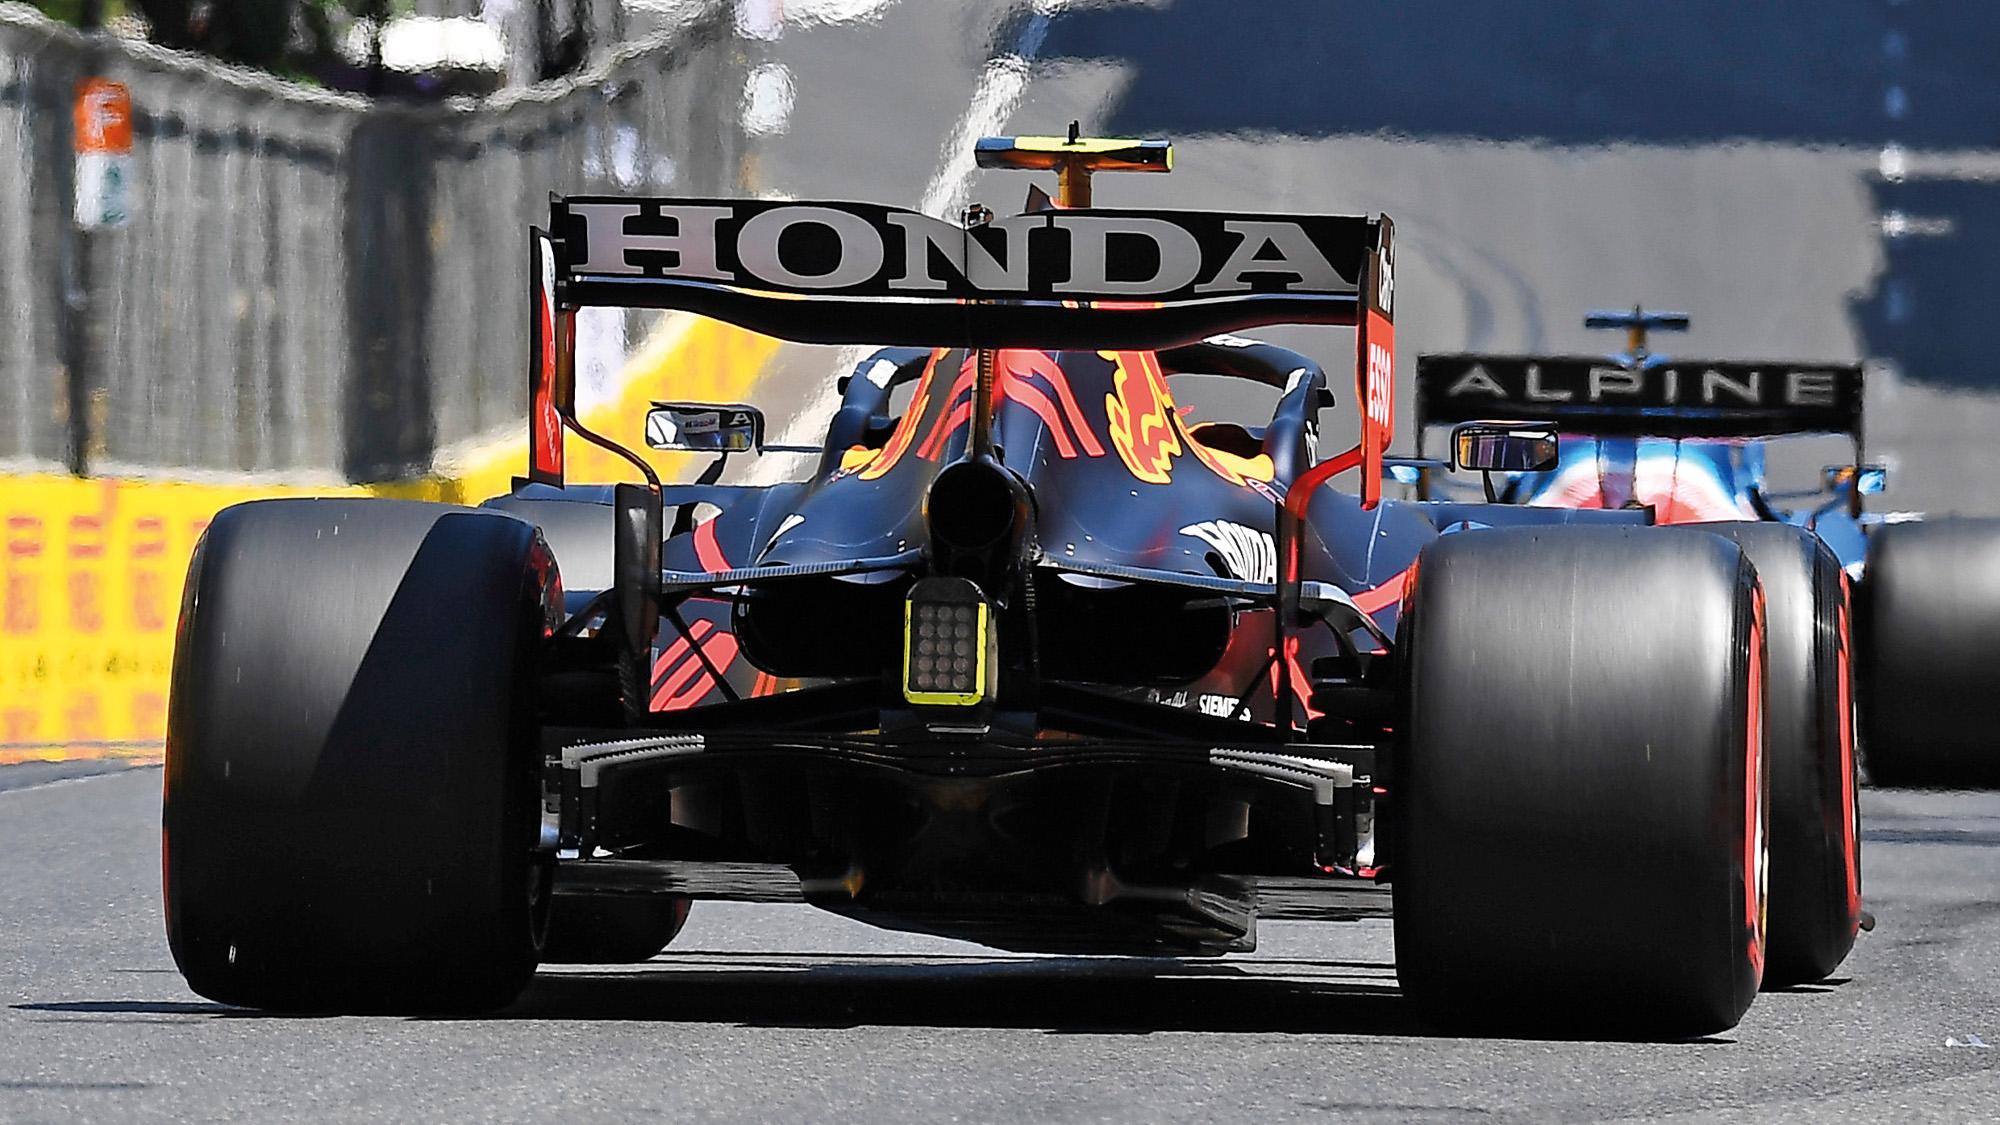 Red Bull rear wing at the 2021 Azerbaijan Grand Prix